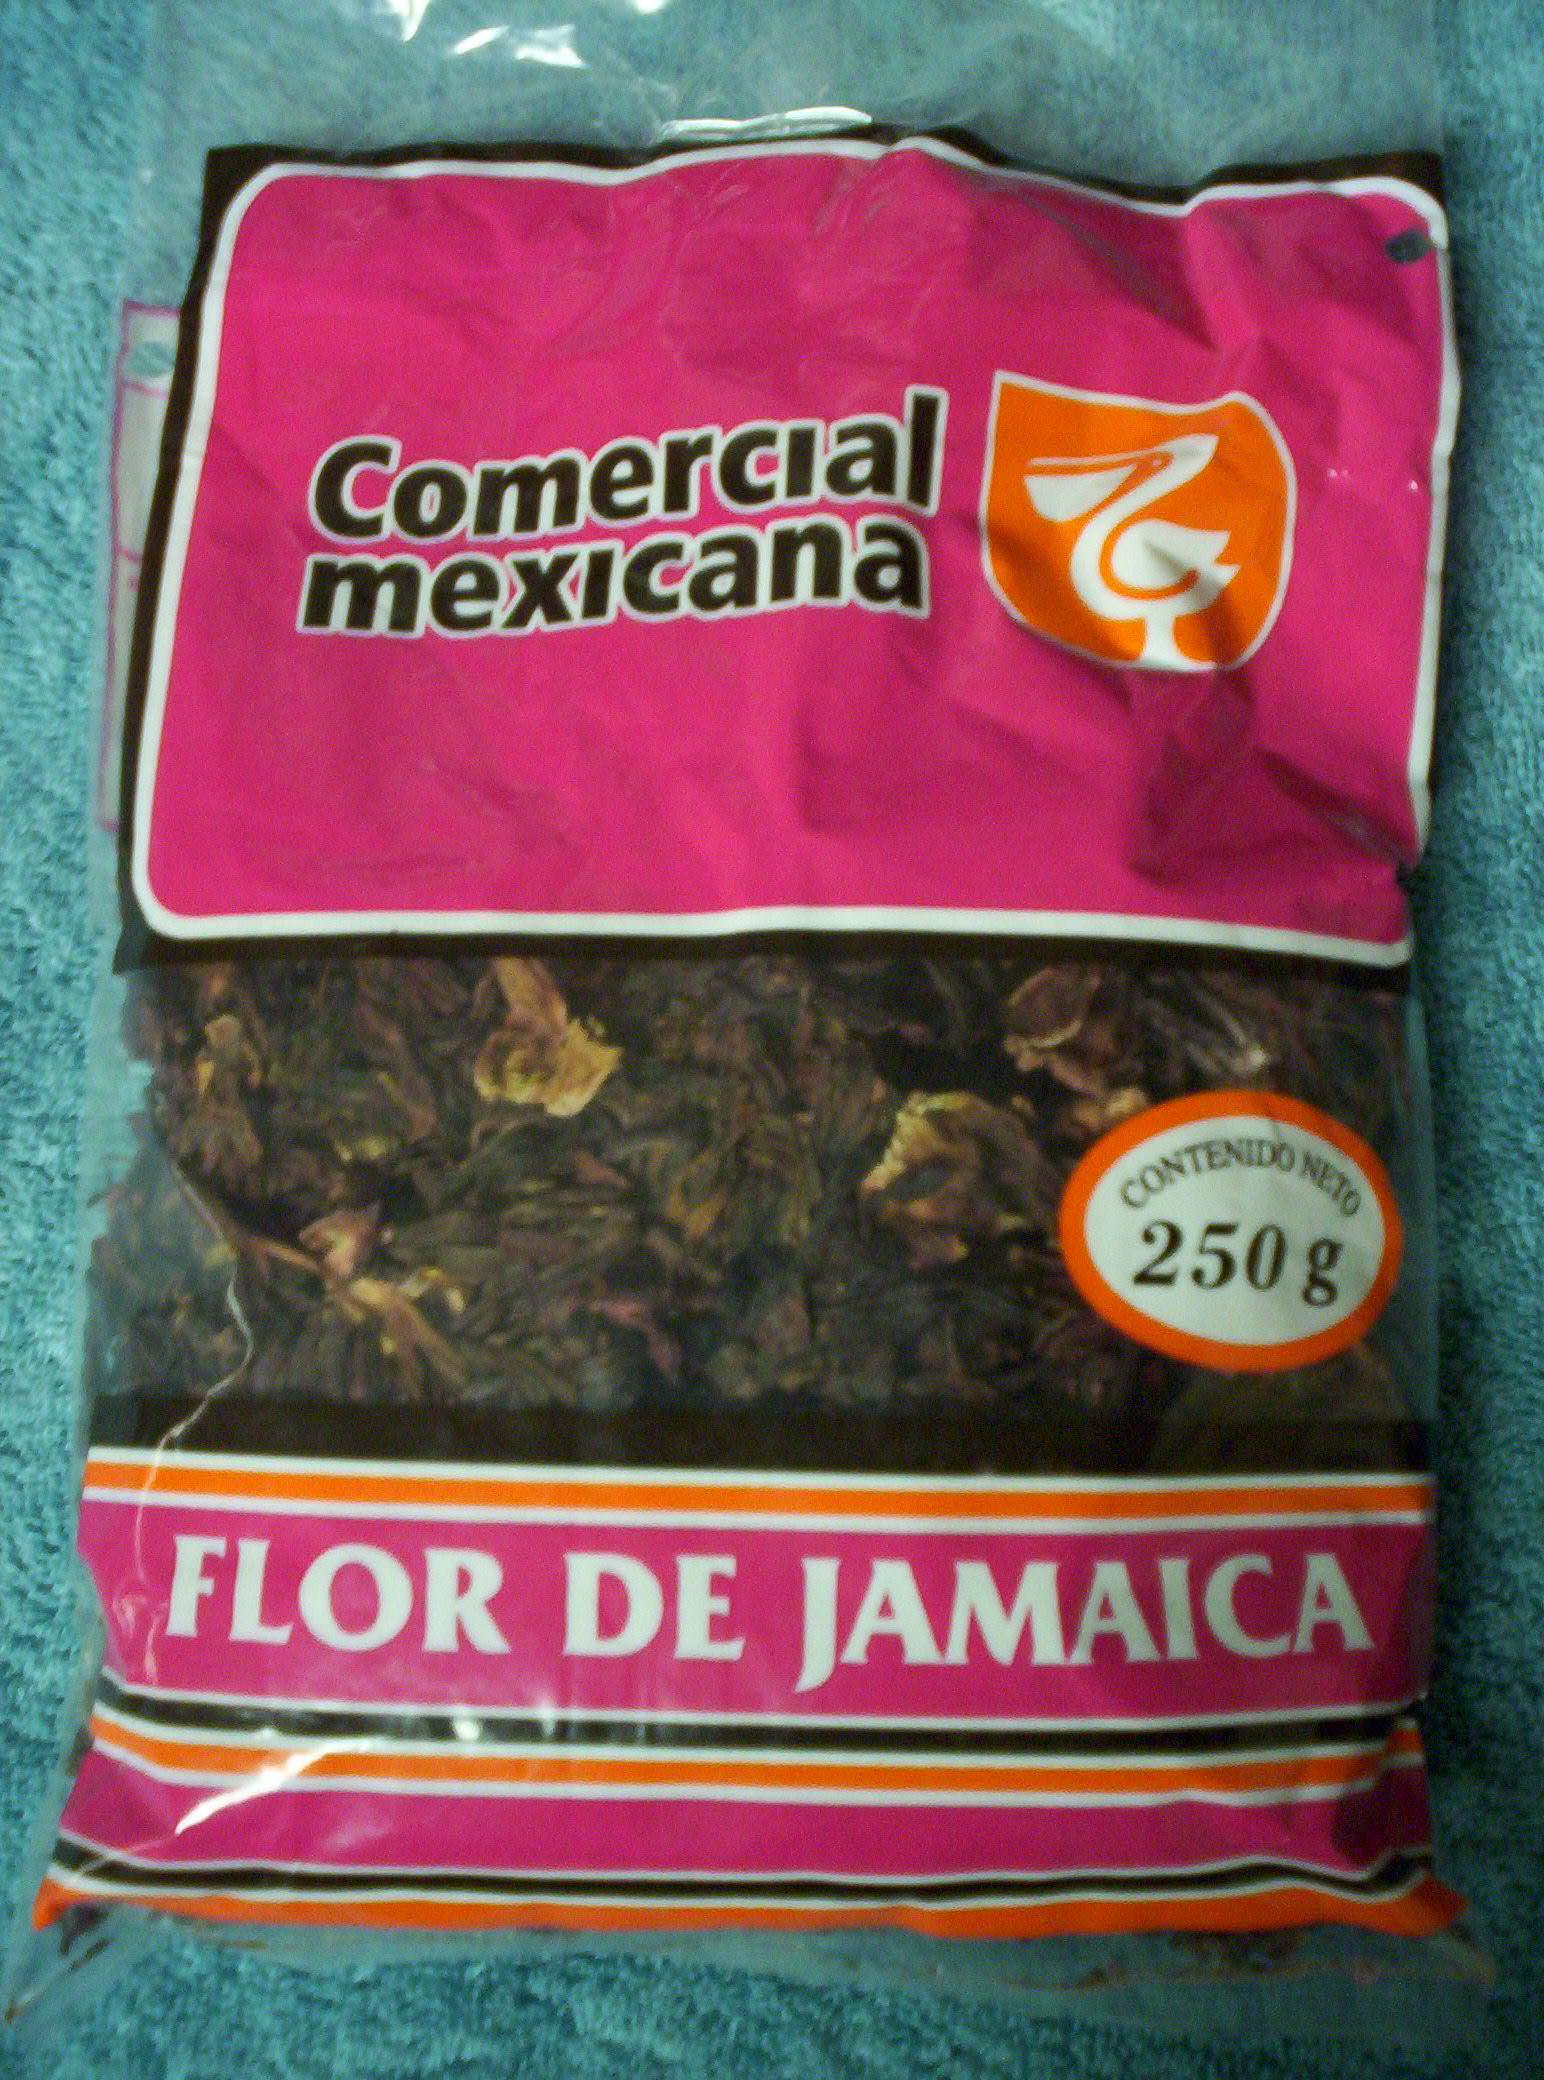 Tea knowledge by sweetooth design hibiscus tea httpuploadmediawikipediacommons0 bag of hibiscus izmirmasajfo Choice Image